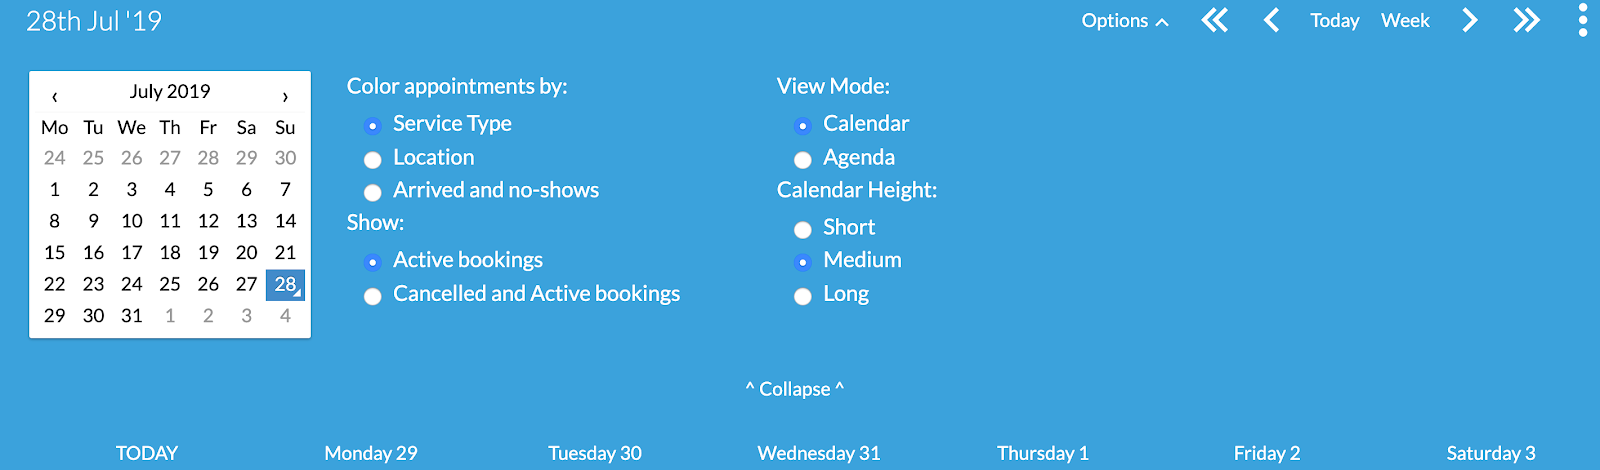 calendar view settings